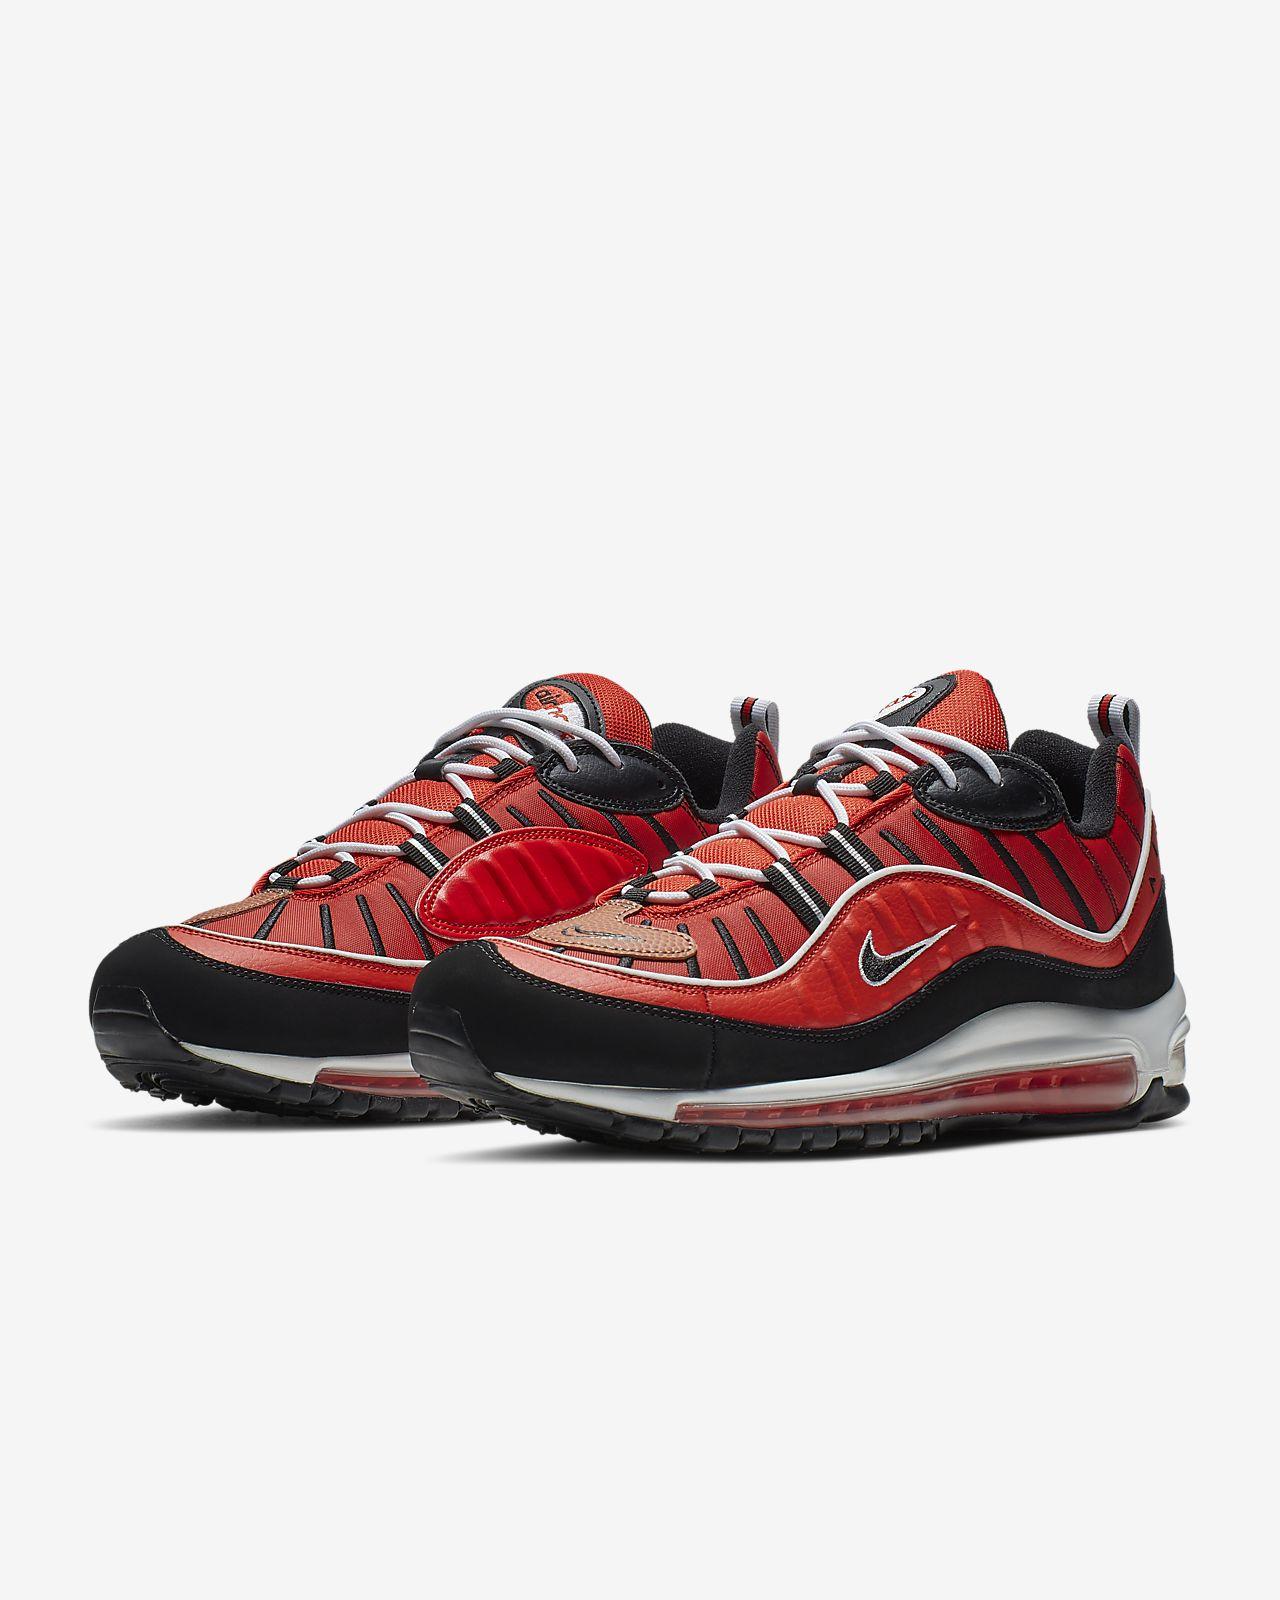 quality design 63968 5eeb1 Nike Air Max 98 Men s Shoe. Nike.com MY